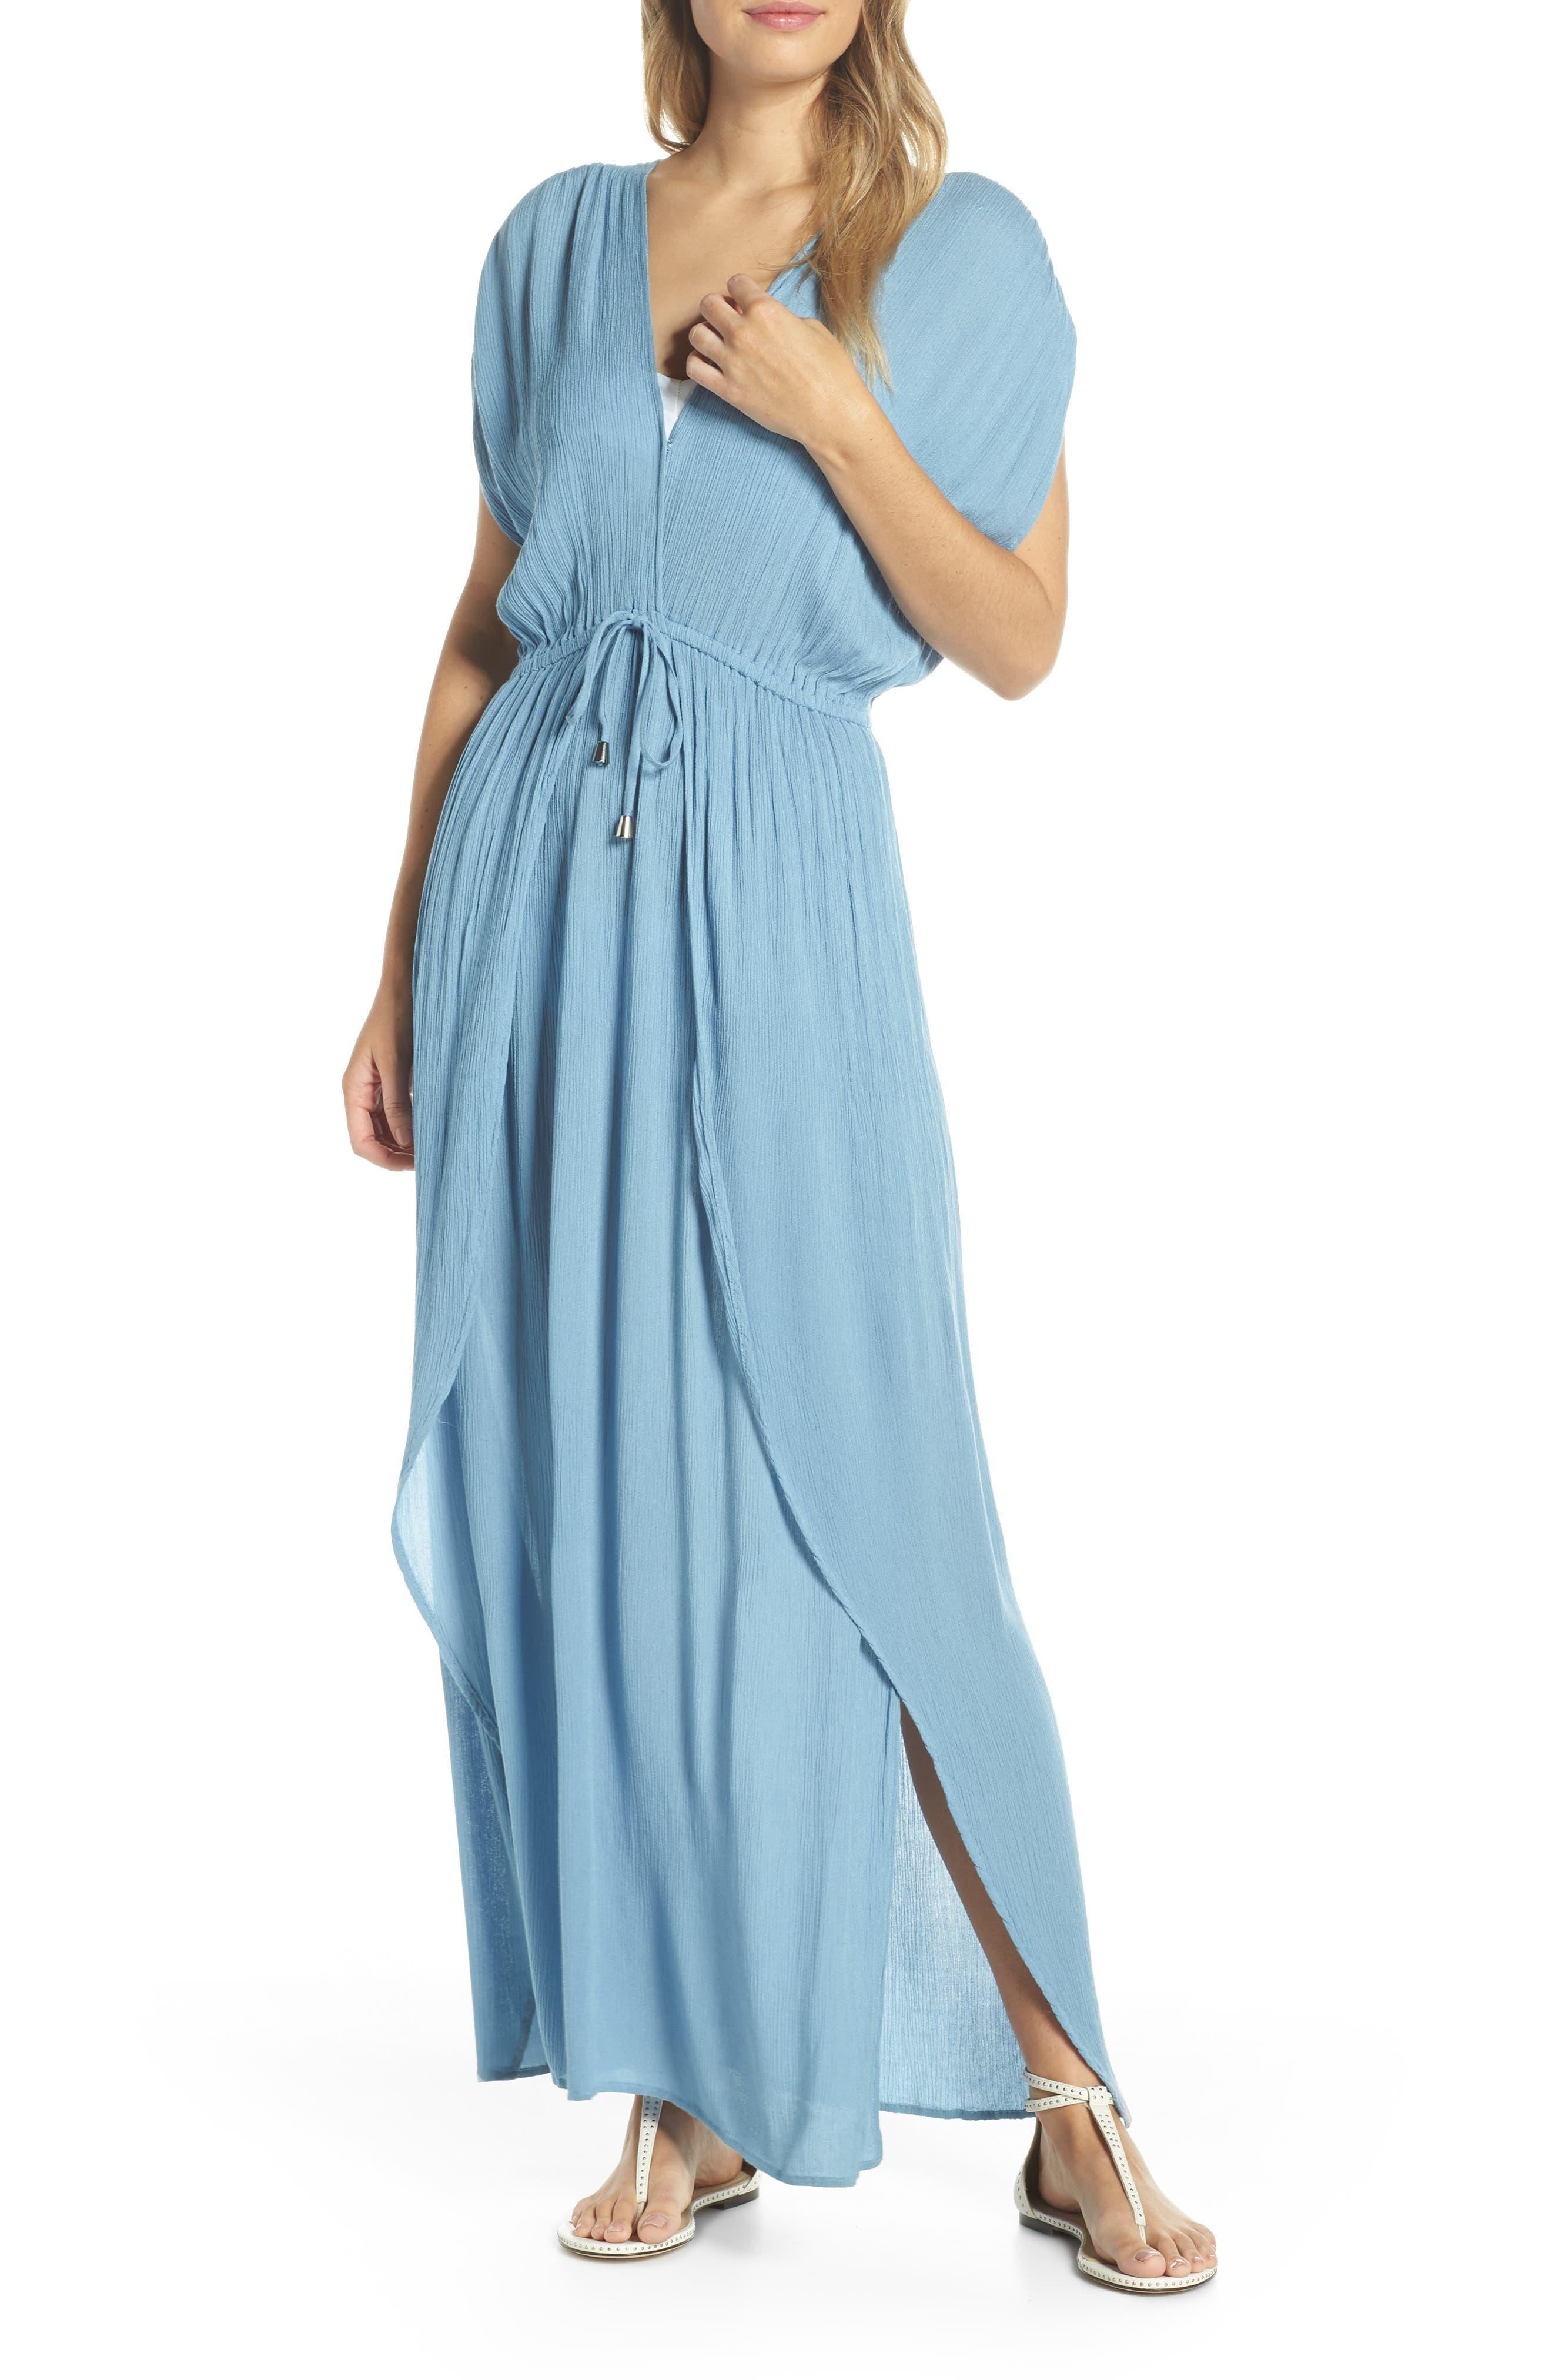 ELAN, Wrap Maxi Cover-Up Dress, Main thumbnail 1, color, WASHED BLUE